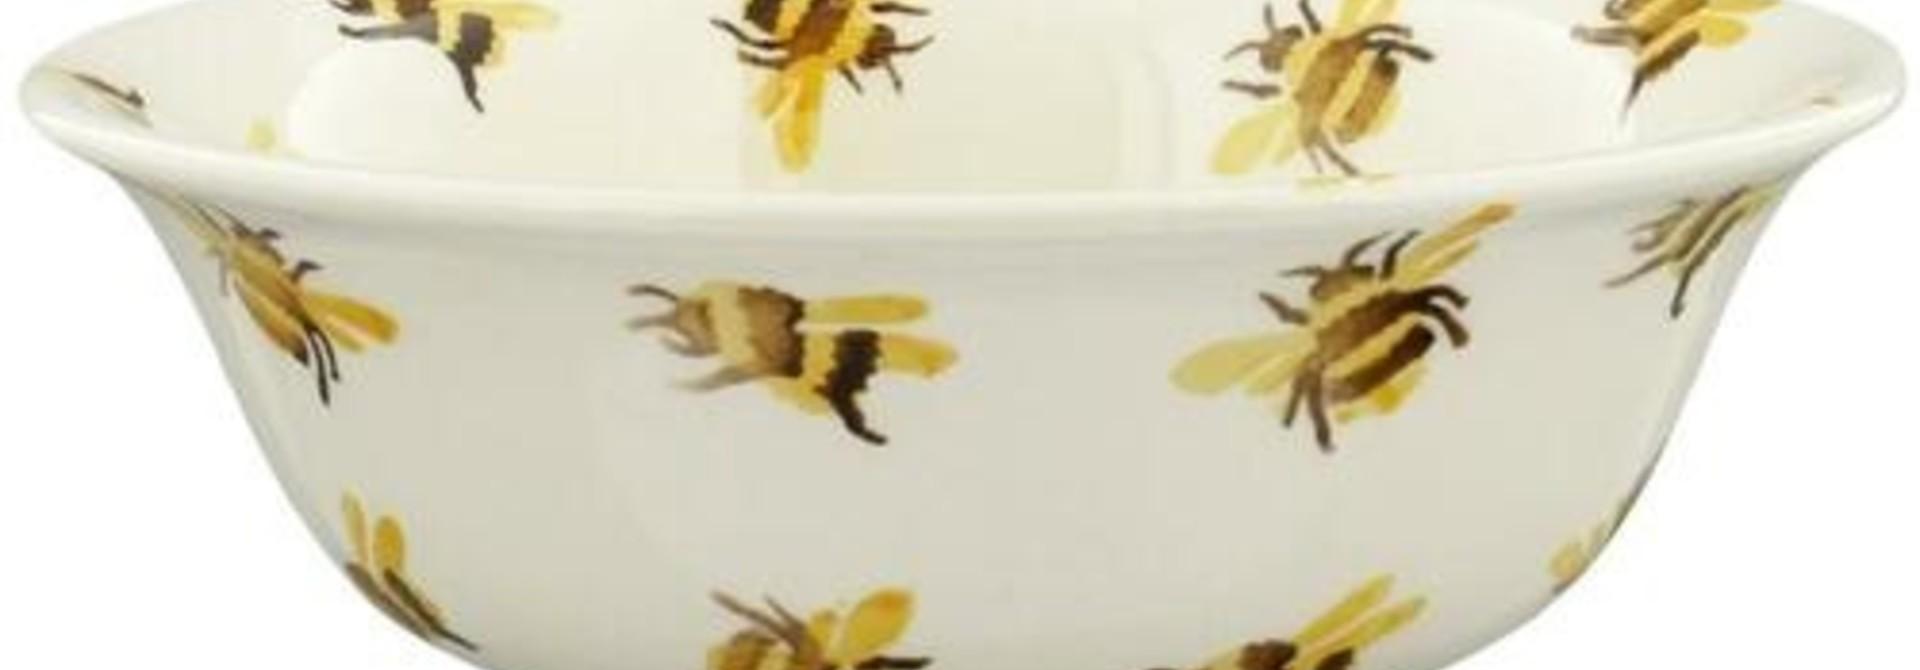 Cereal Bowl - Bumblebee